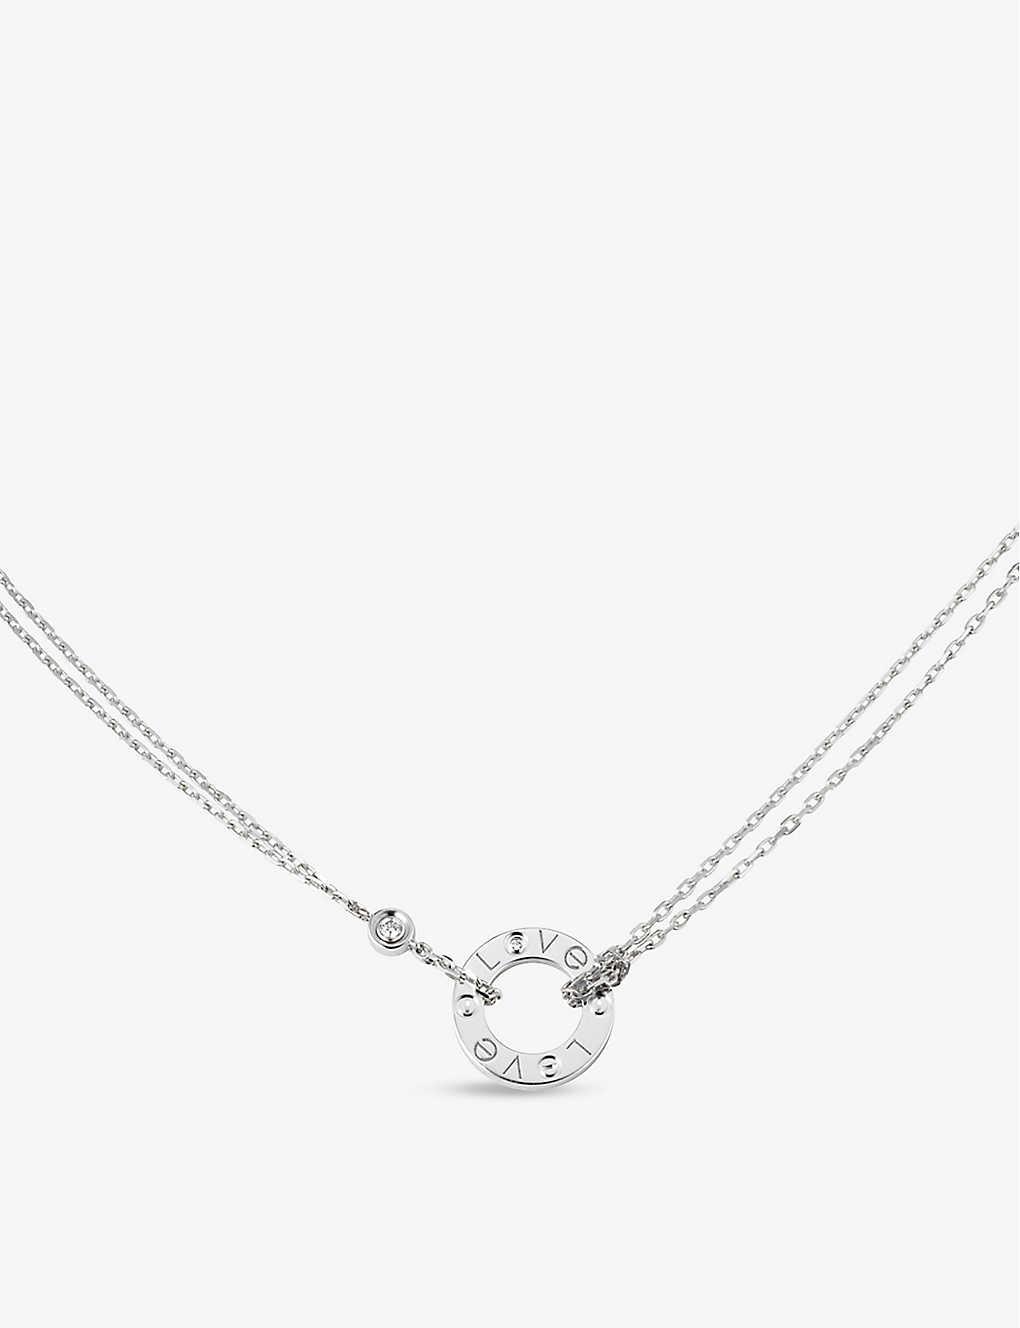 3e3a4a85c07105 CARTIER - Love 18ct white-gold and diamond necklace | Selfridges.com